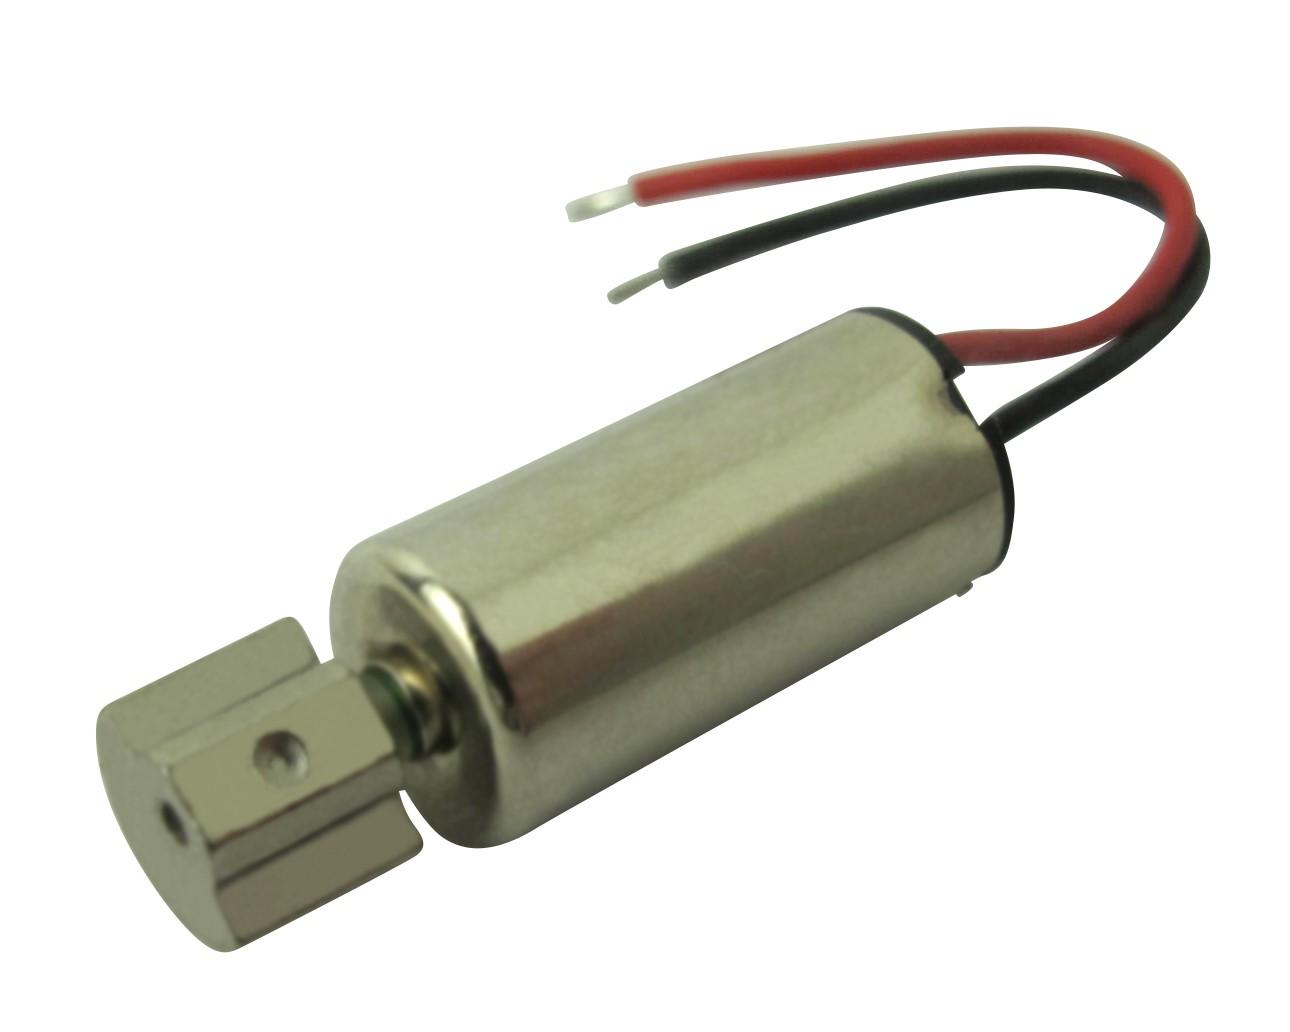 Z6DL2B0050001 Cylindrical Vibrator Motor